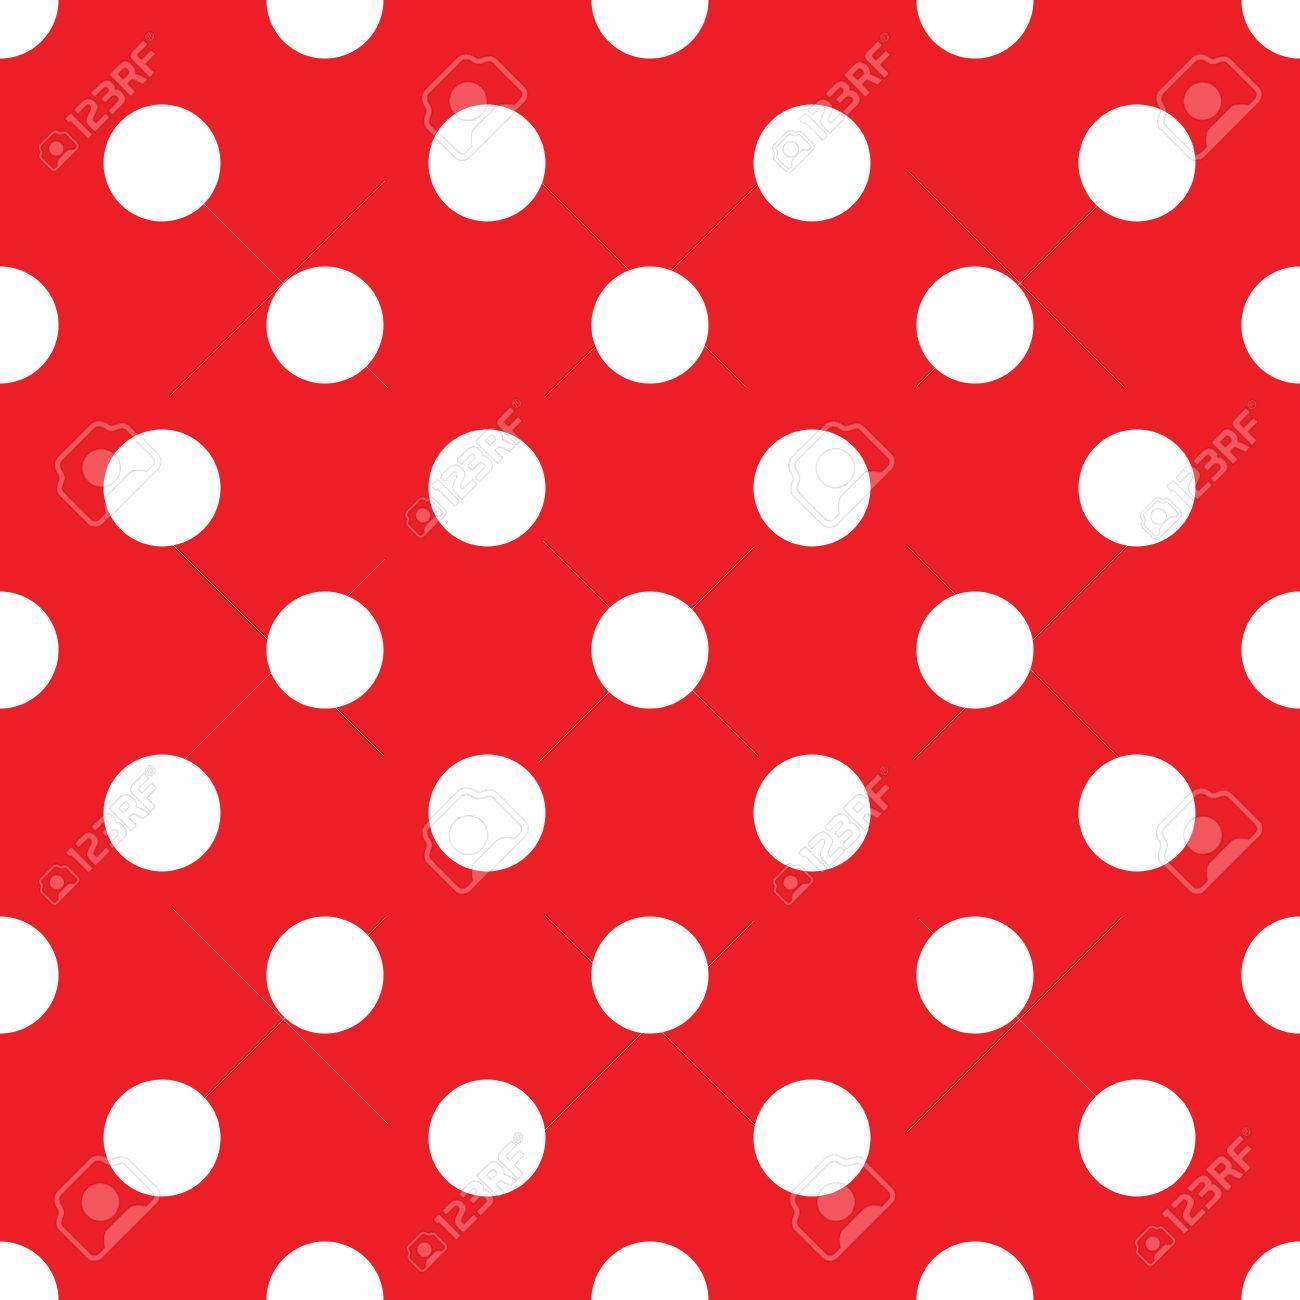 seamless red polka dot background - 37702632